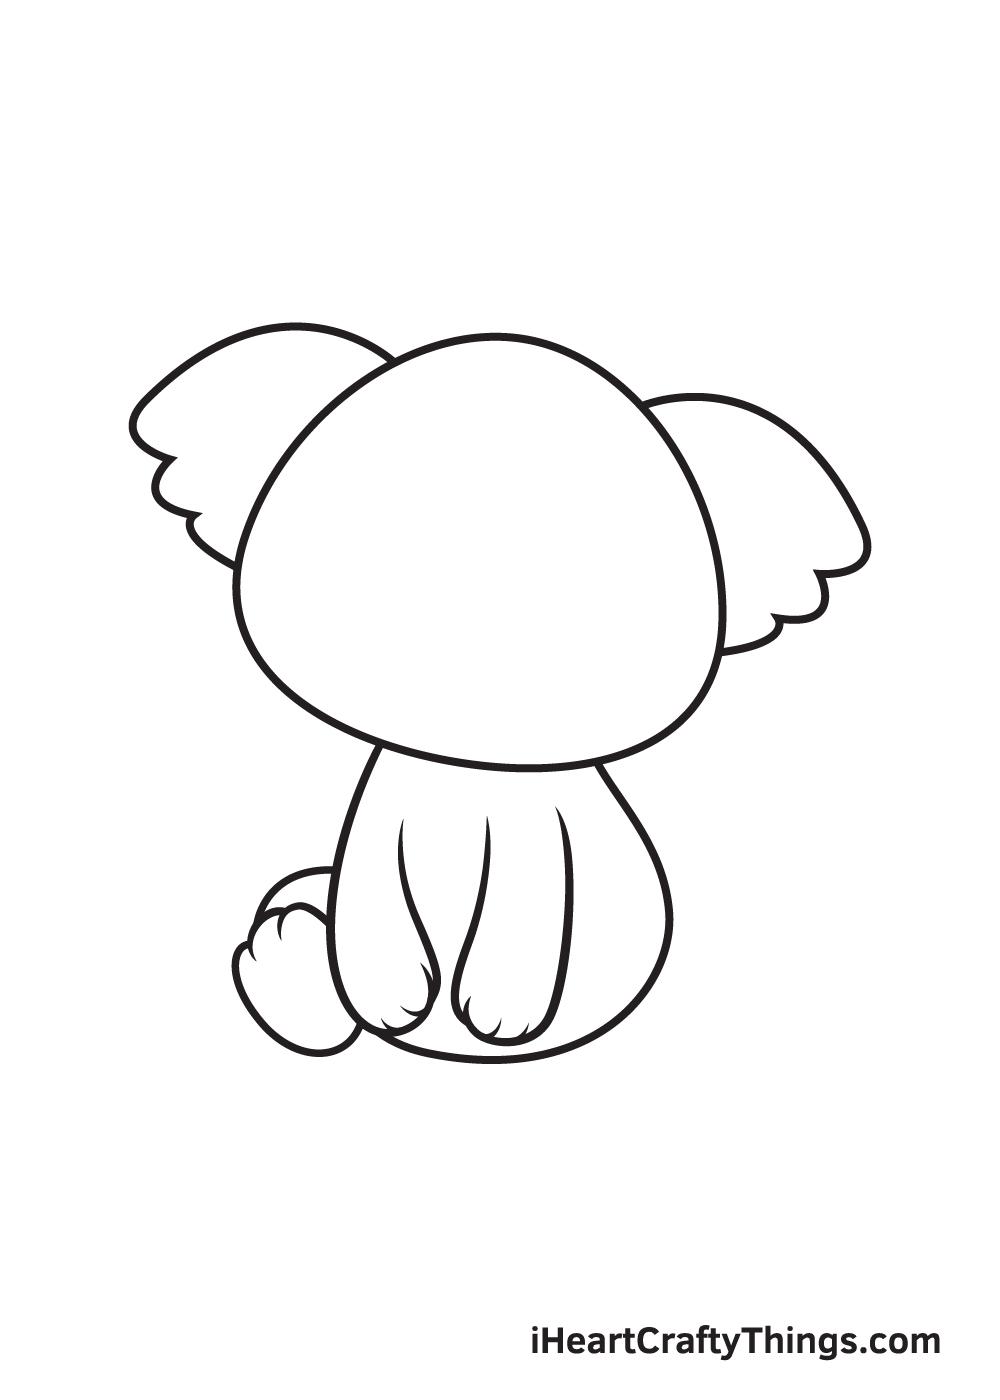 animals drawing step 5